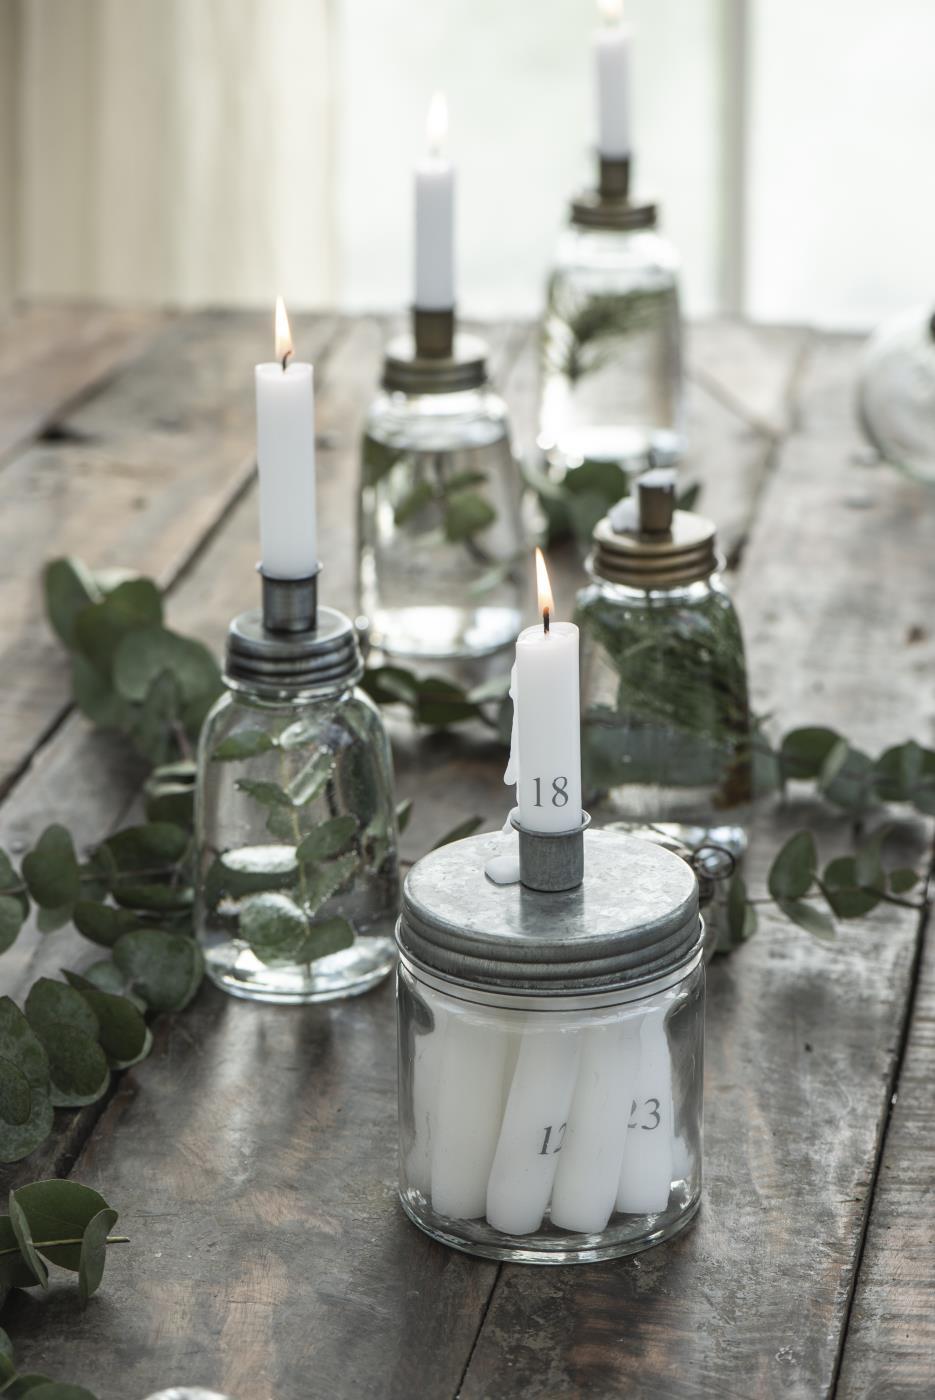 Kerzenhalter f/Stabkerze Metalldeckel niedrig